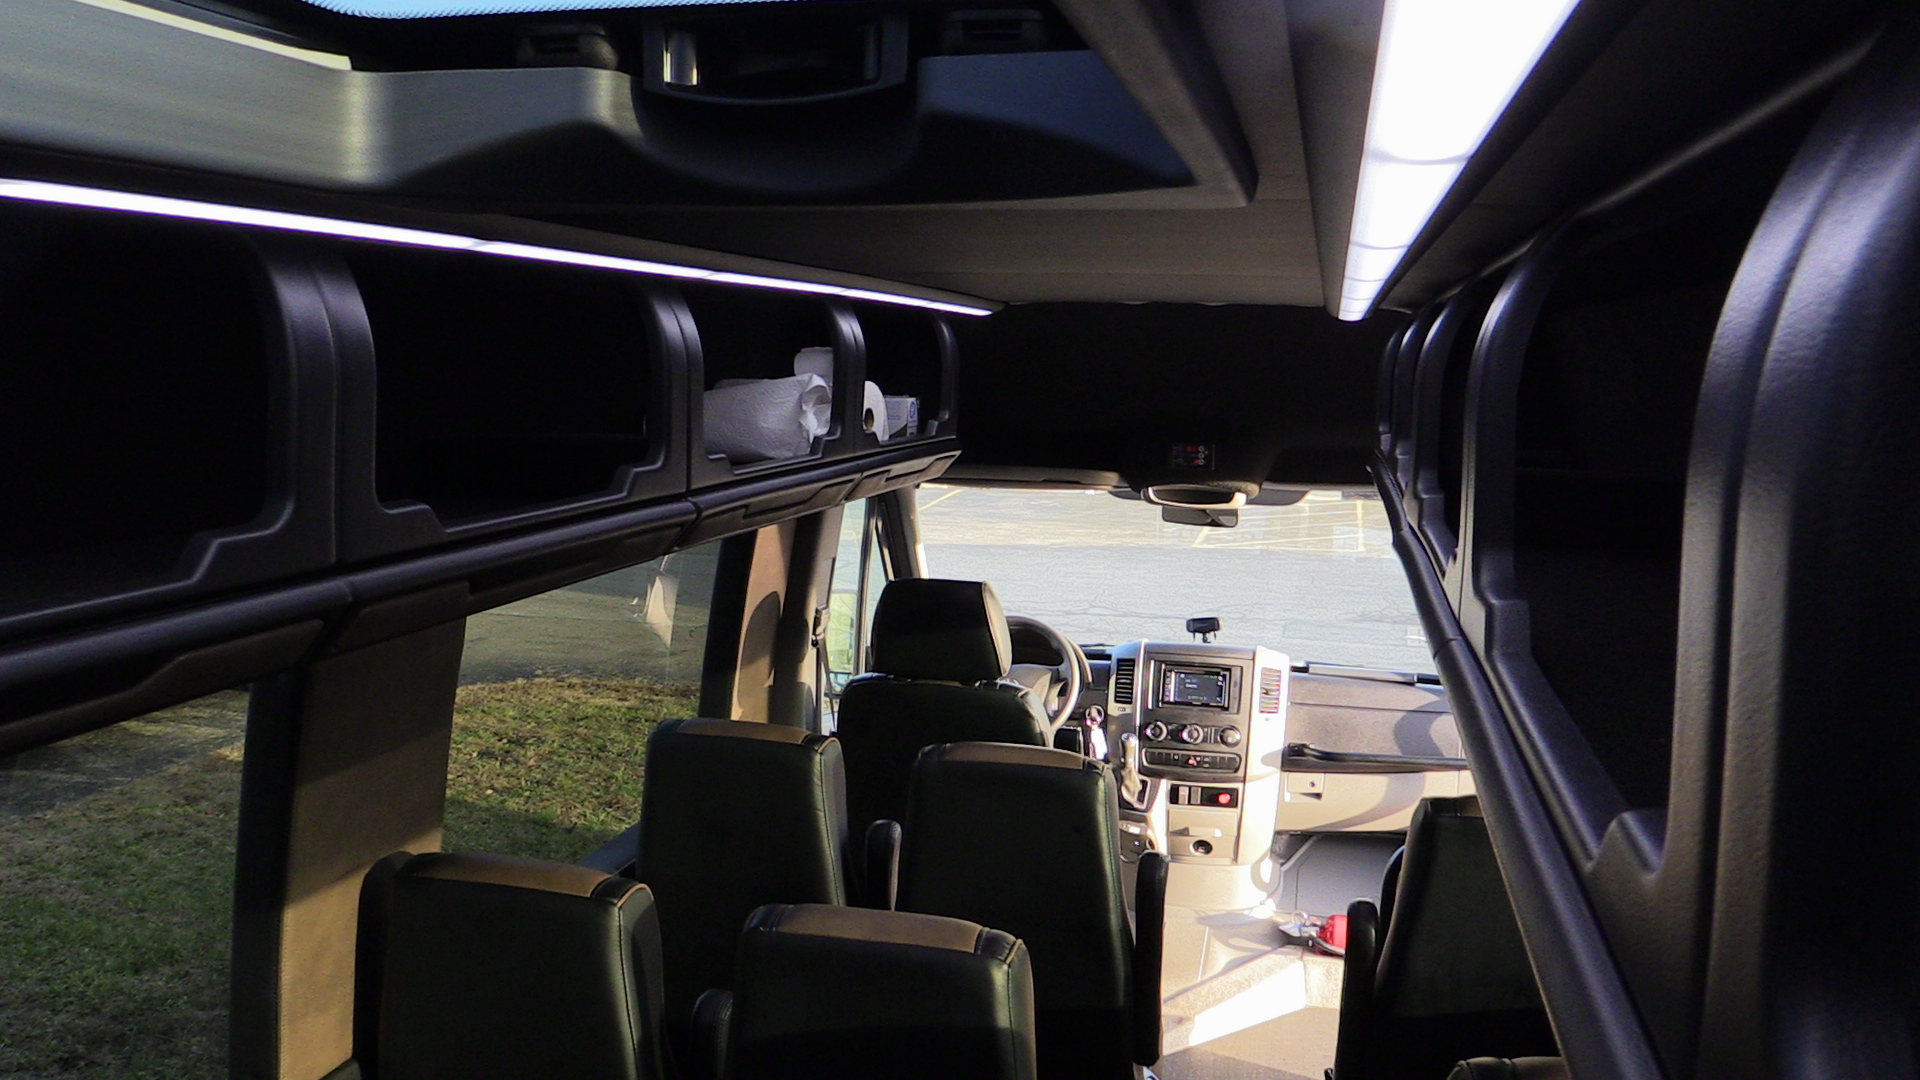 Black Shuttle Overhead Storage.JPG